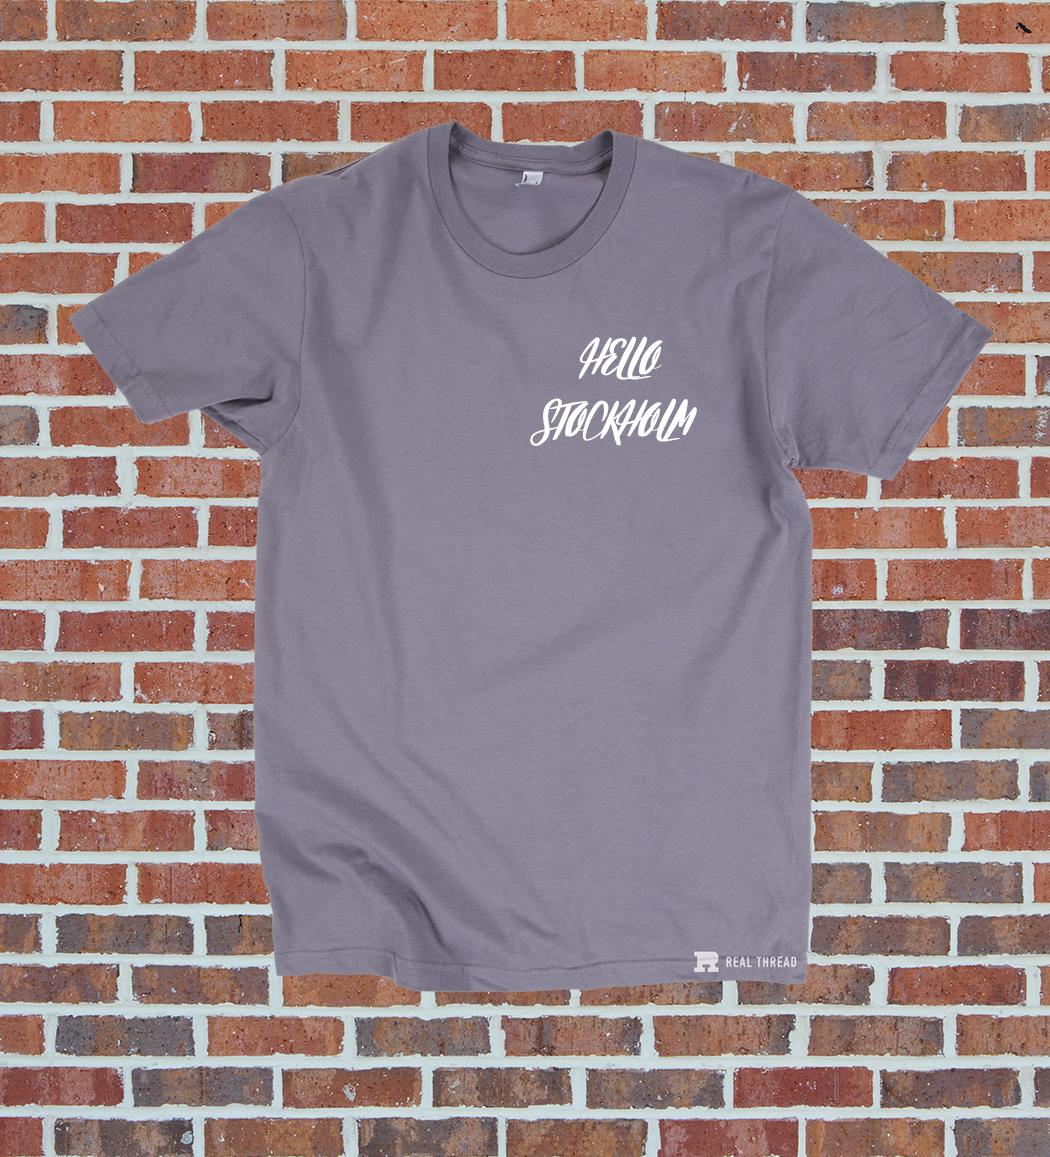 6645a3d9 Best Fonts for T-Shirts | 20 Free T-Shirt Font Downloads